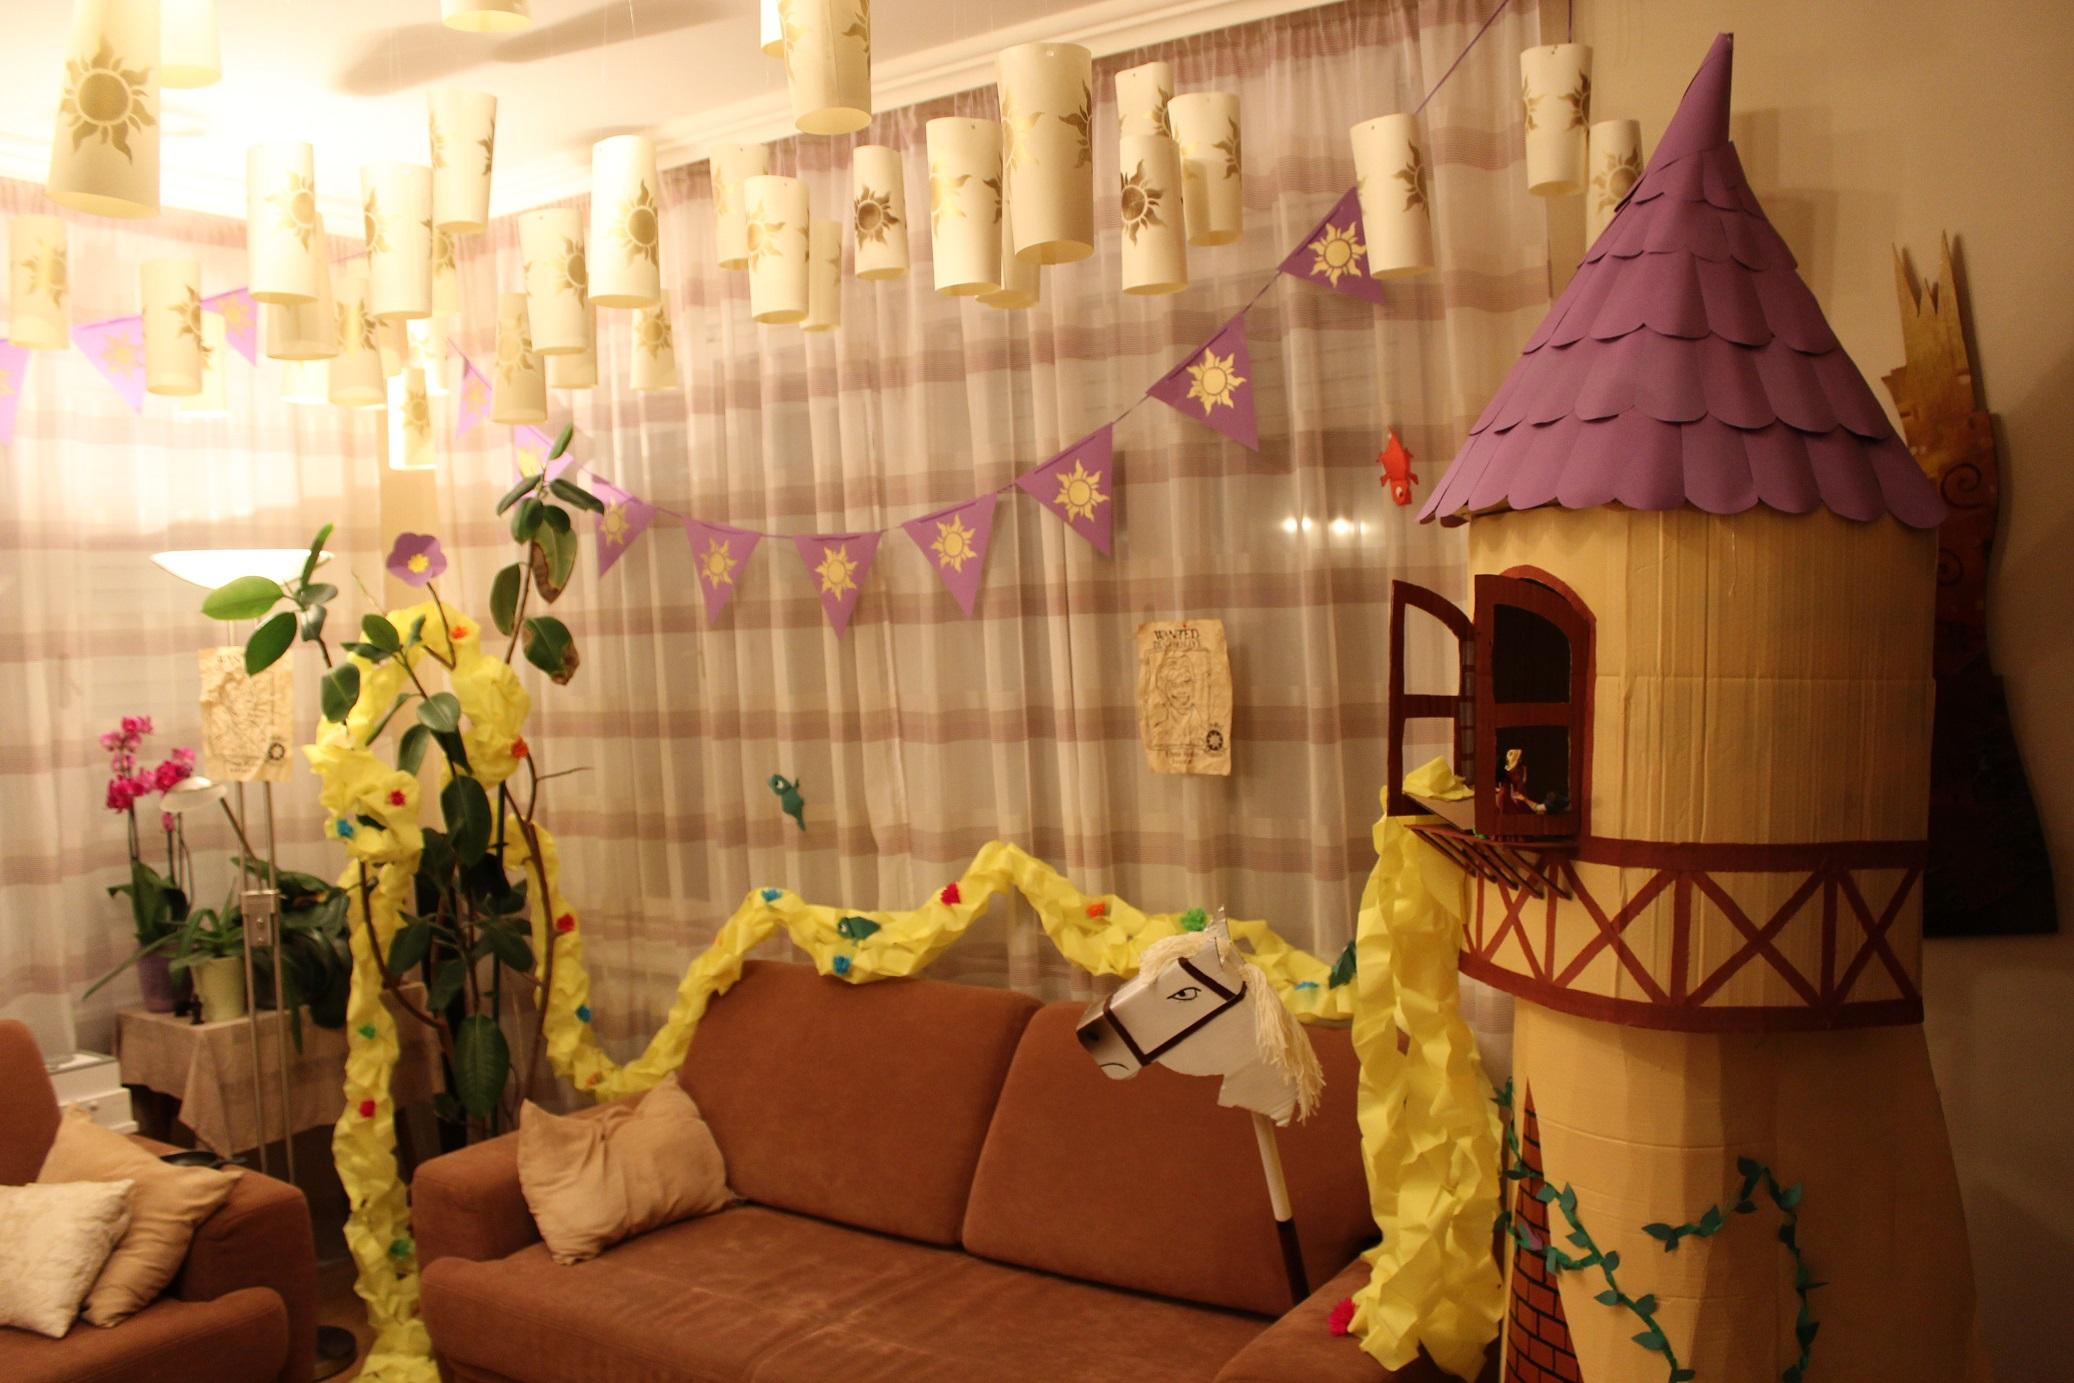 szmk_tangled_aranyhaj_birthday_party_szulinap_dekor_buli_7.JPG